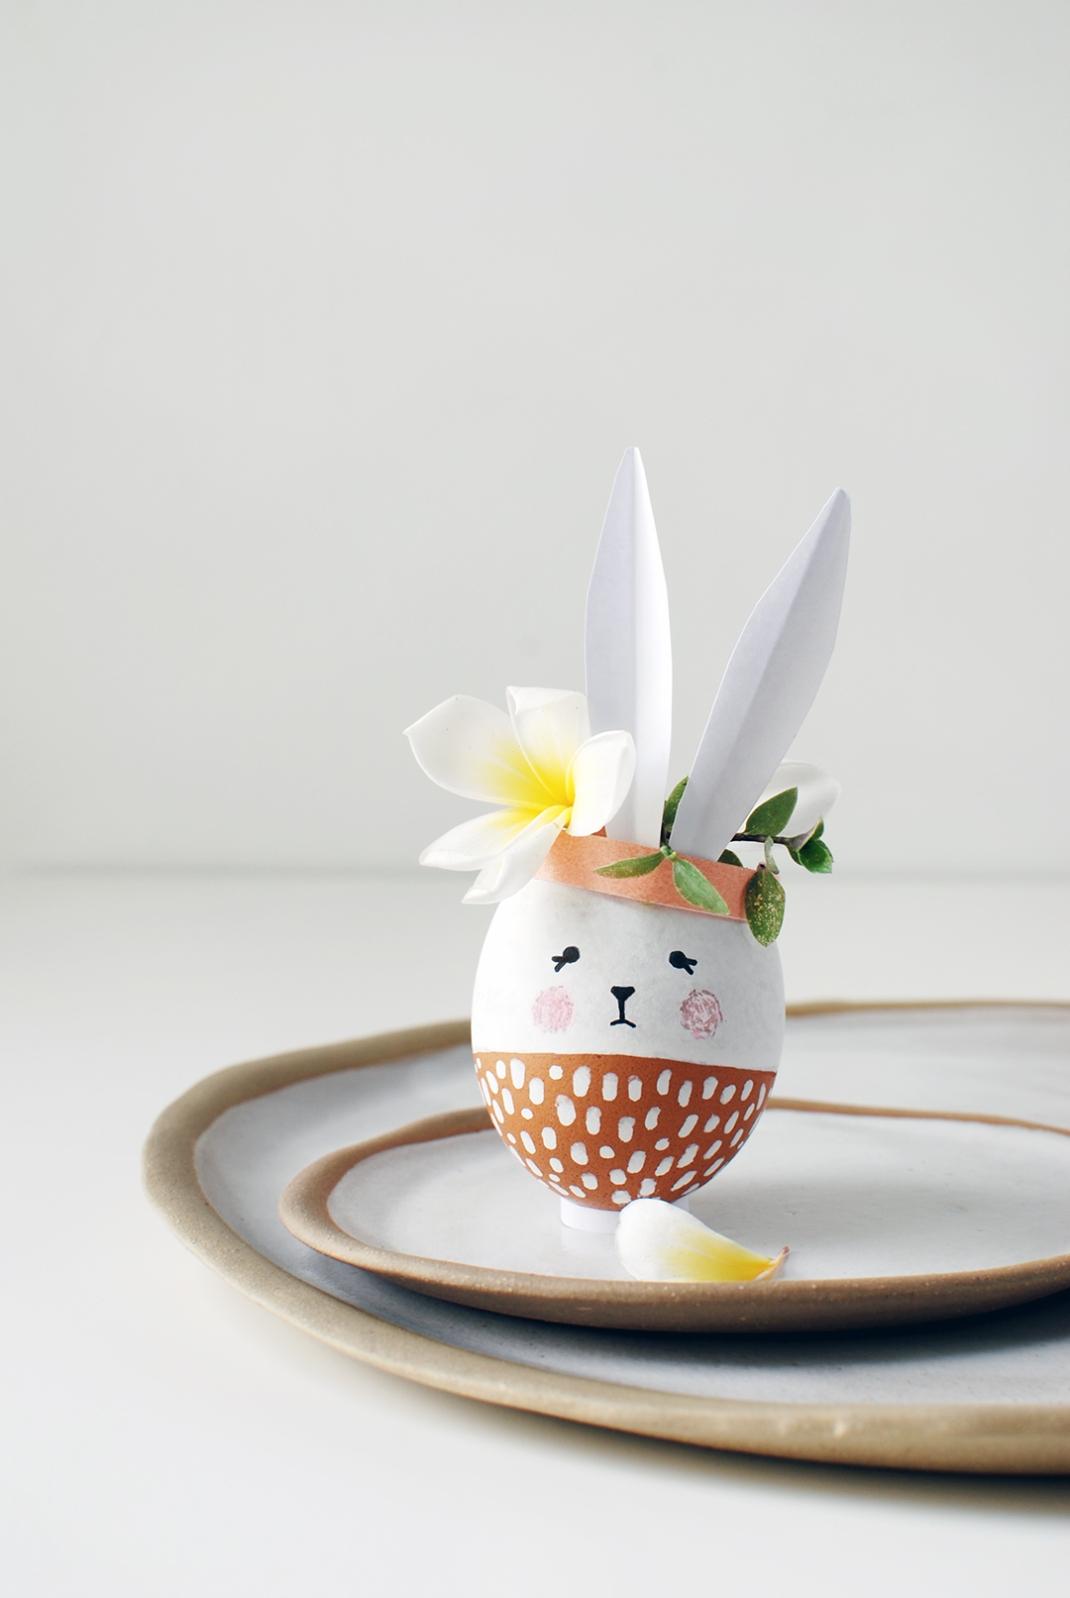 Easter-Bunny-Vases-from-egg-shells-4